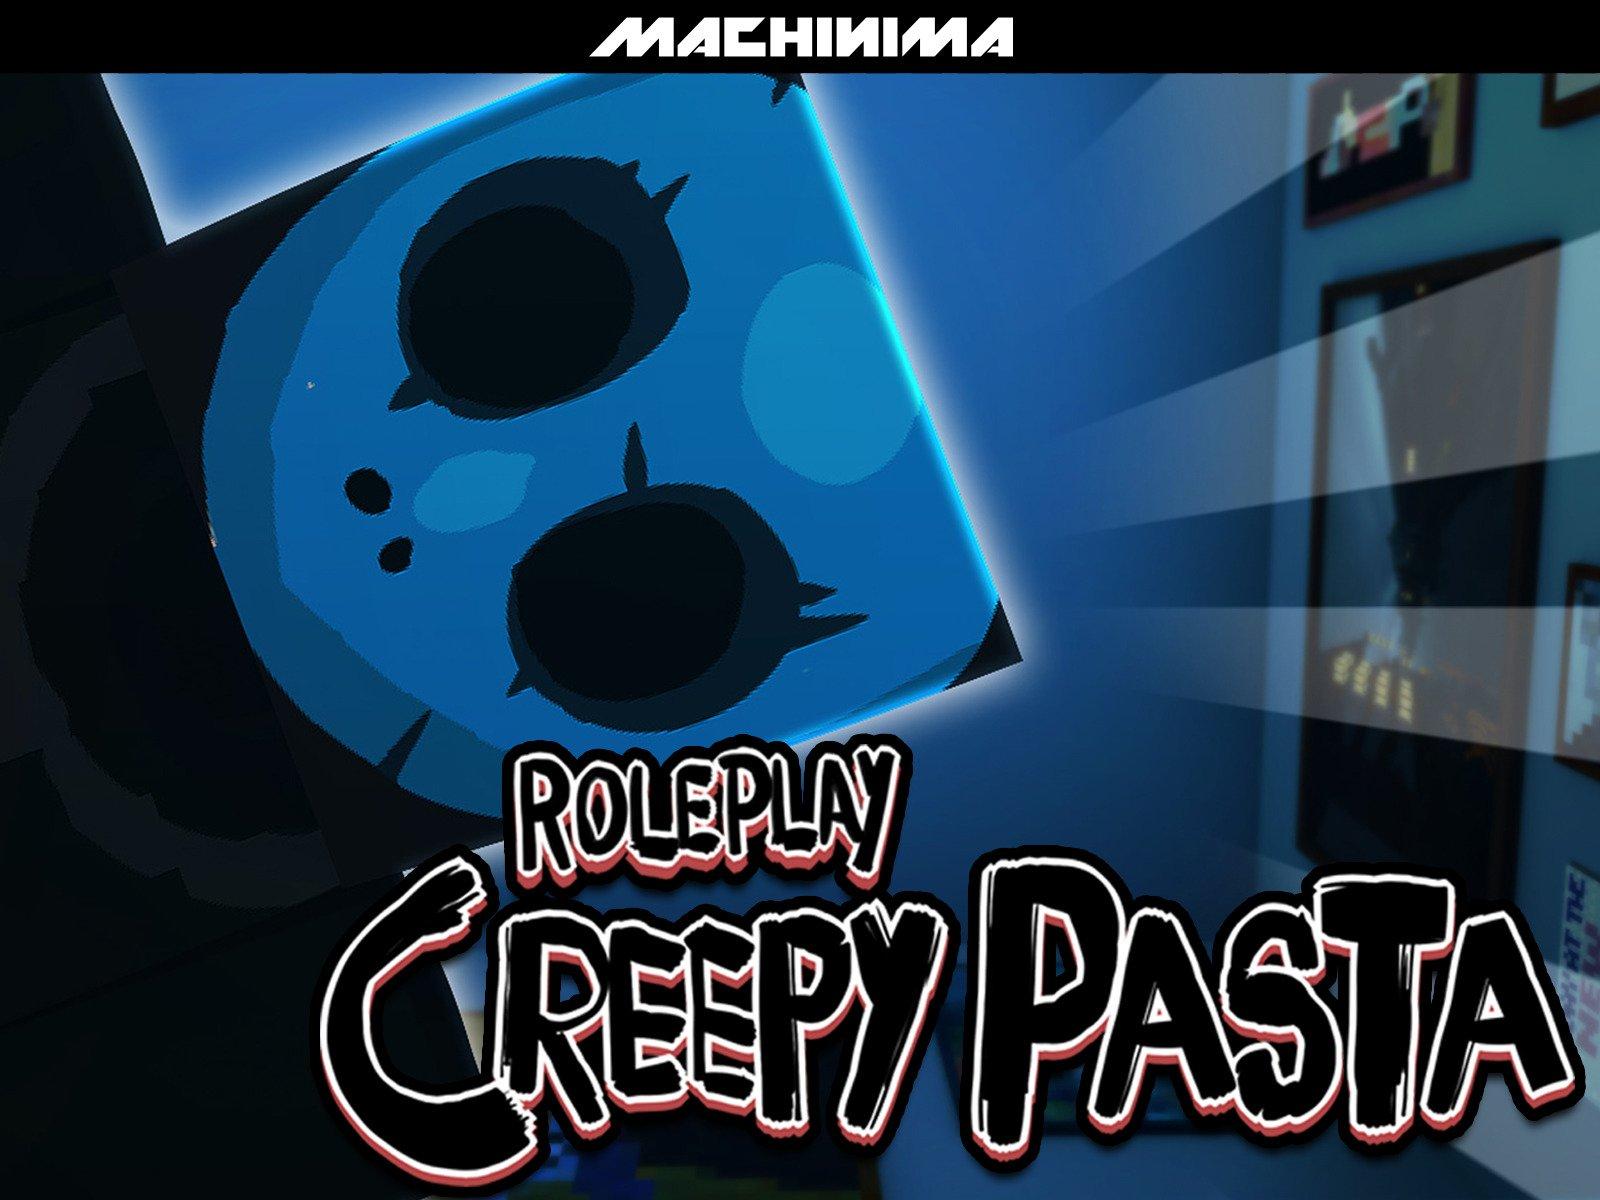 Clip: Roleplay Creepypasta - Season 3